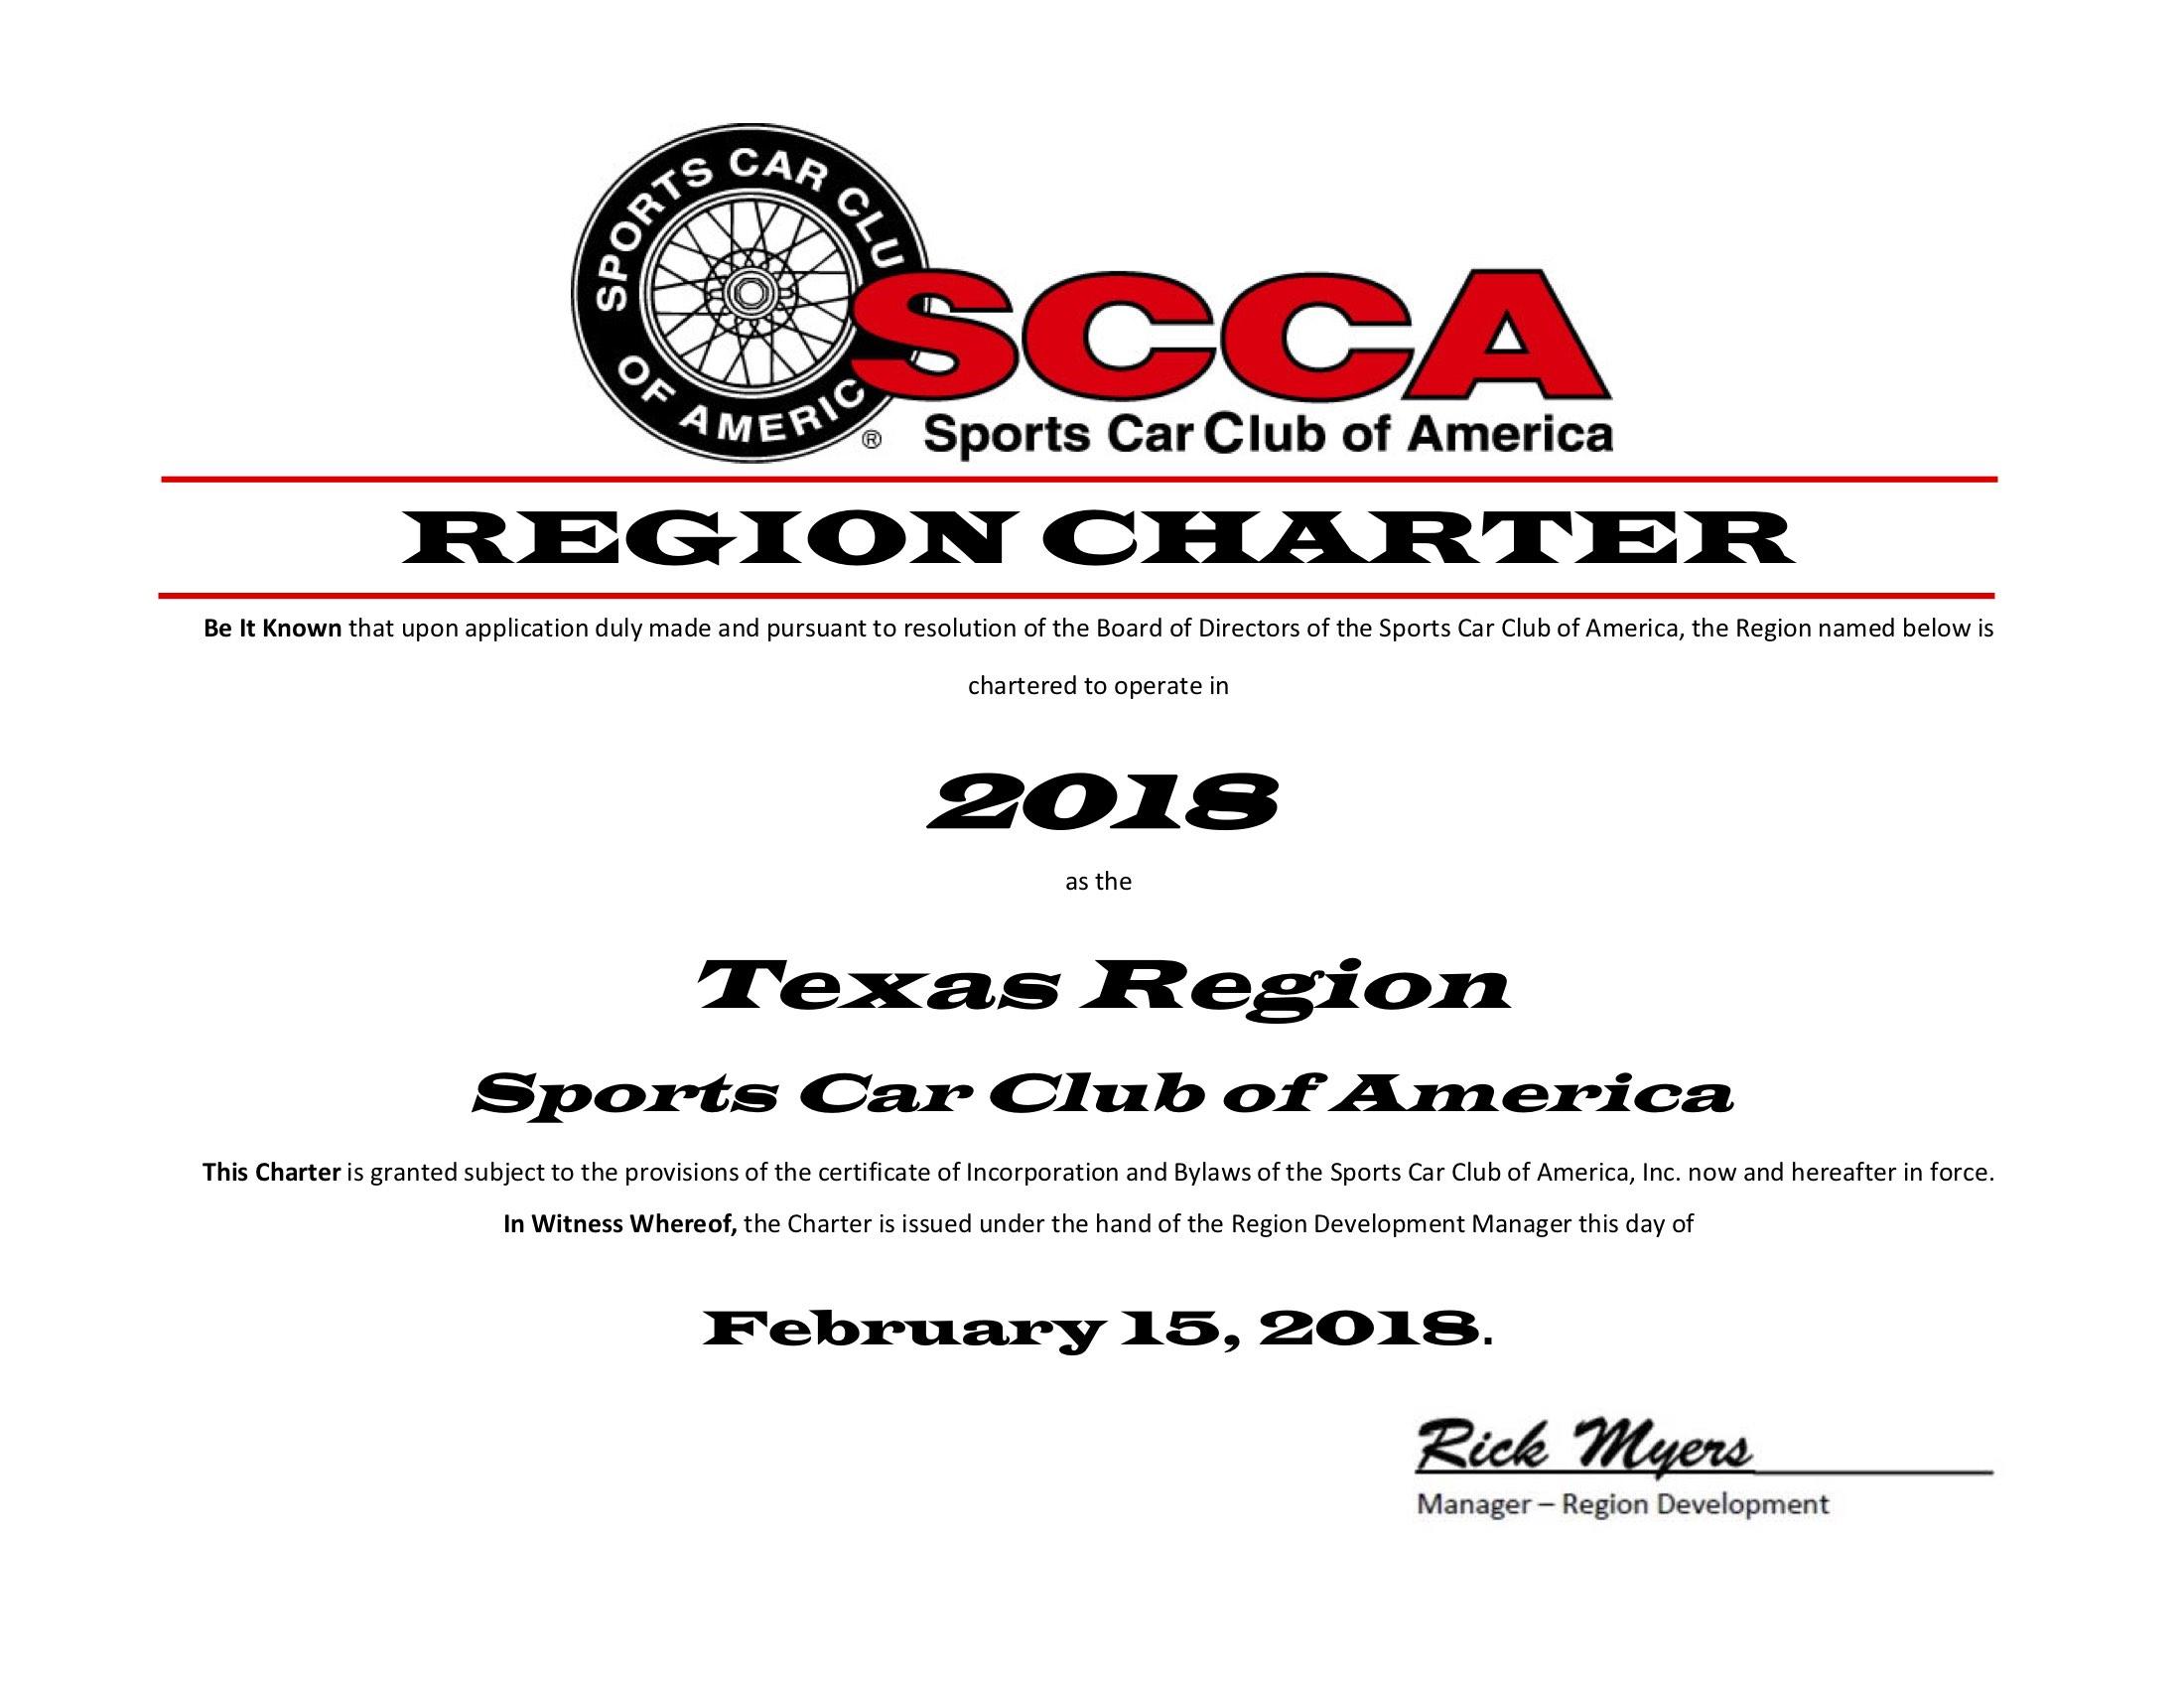 2018 region charter